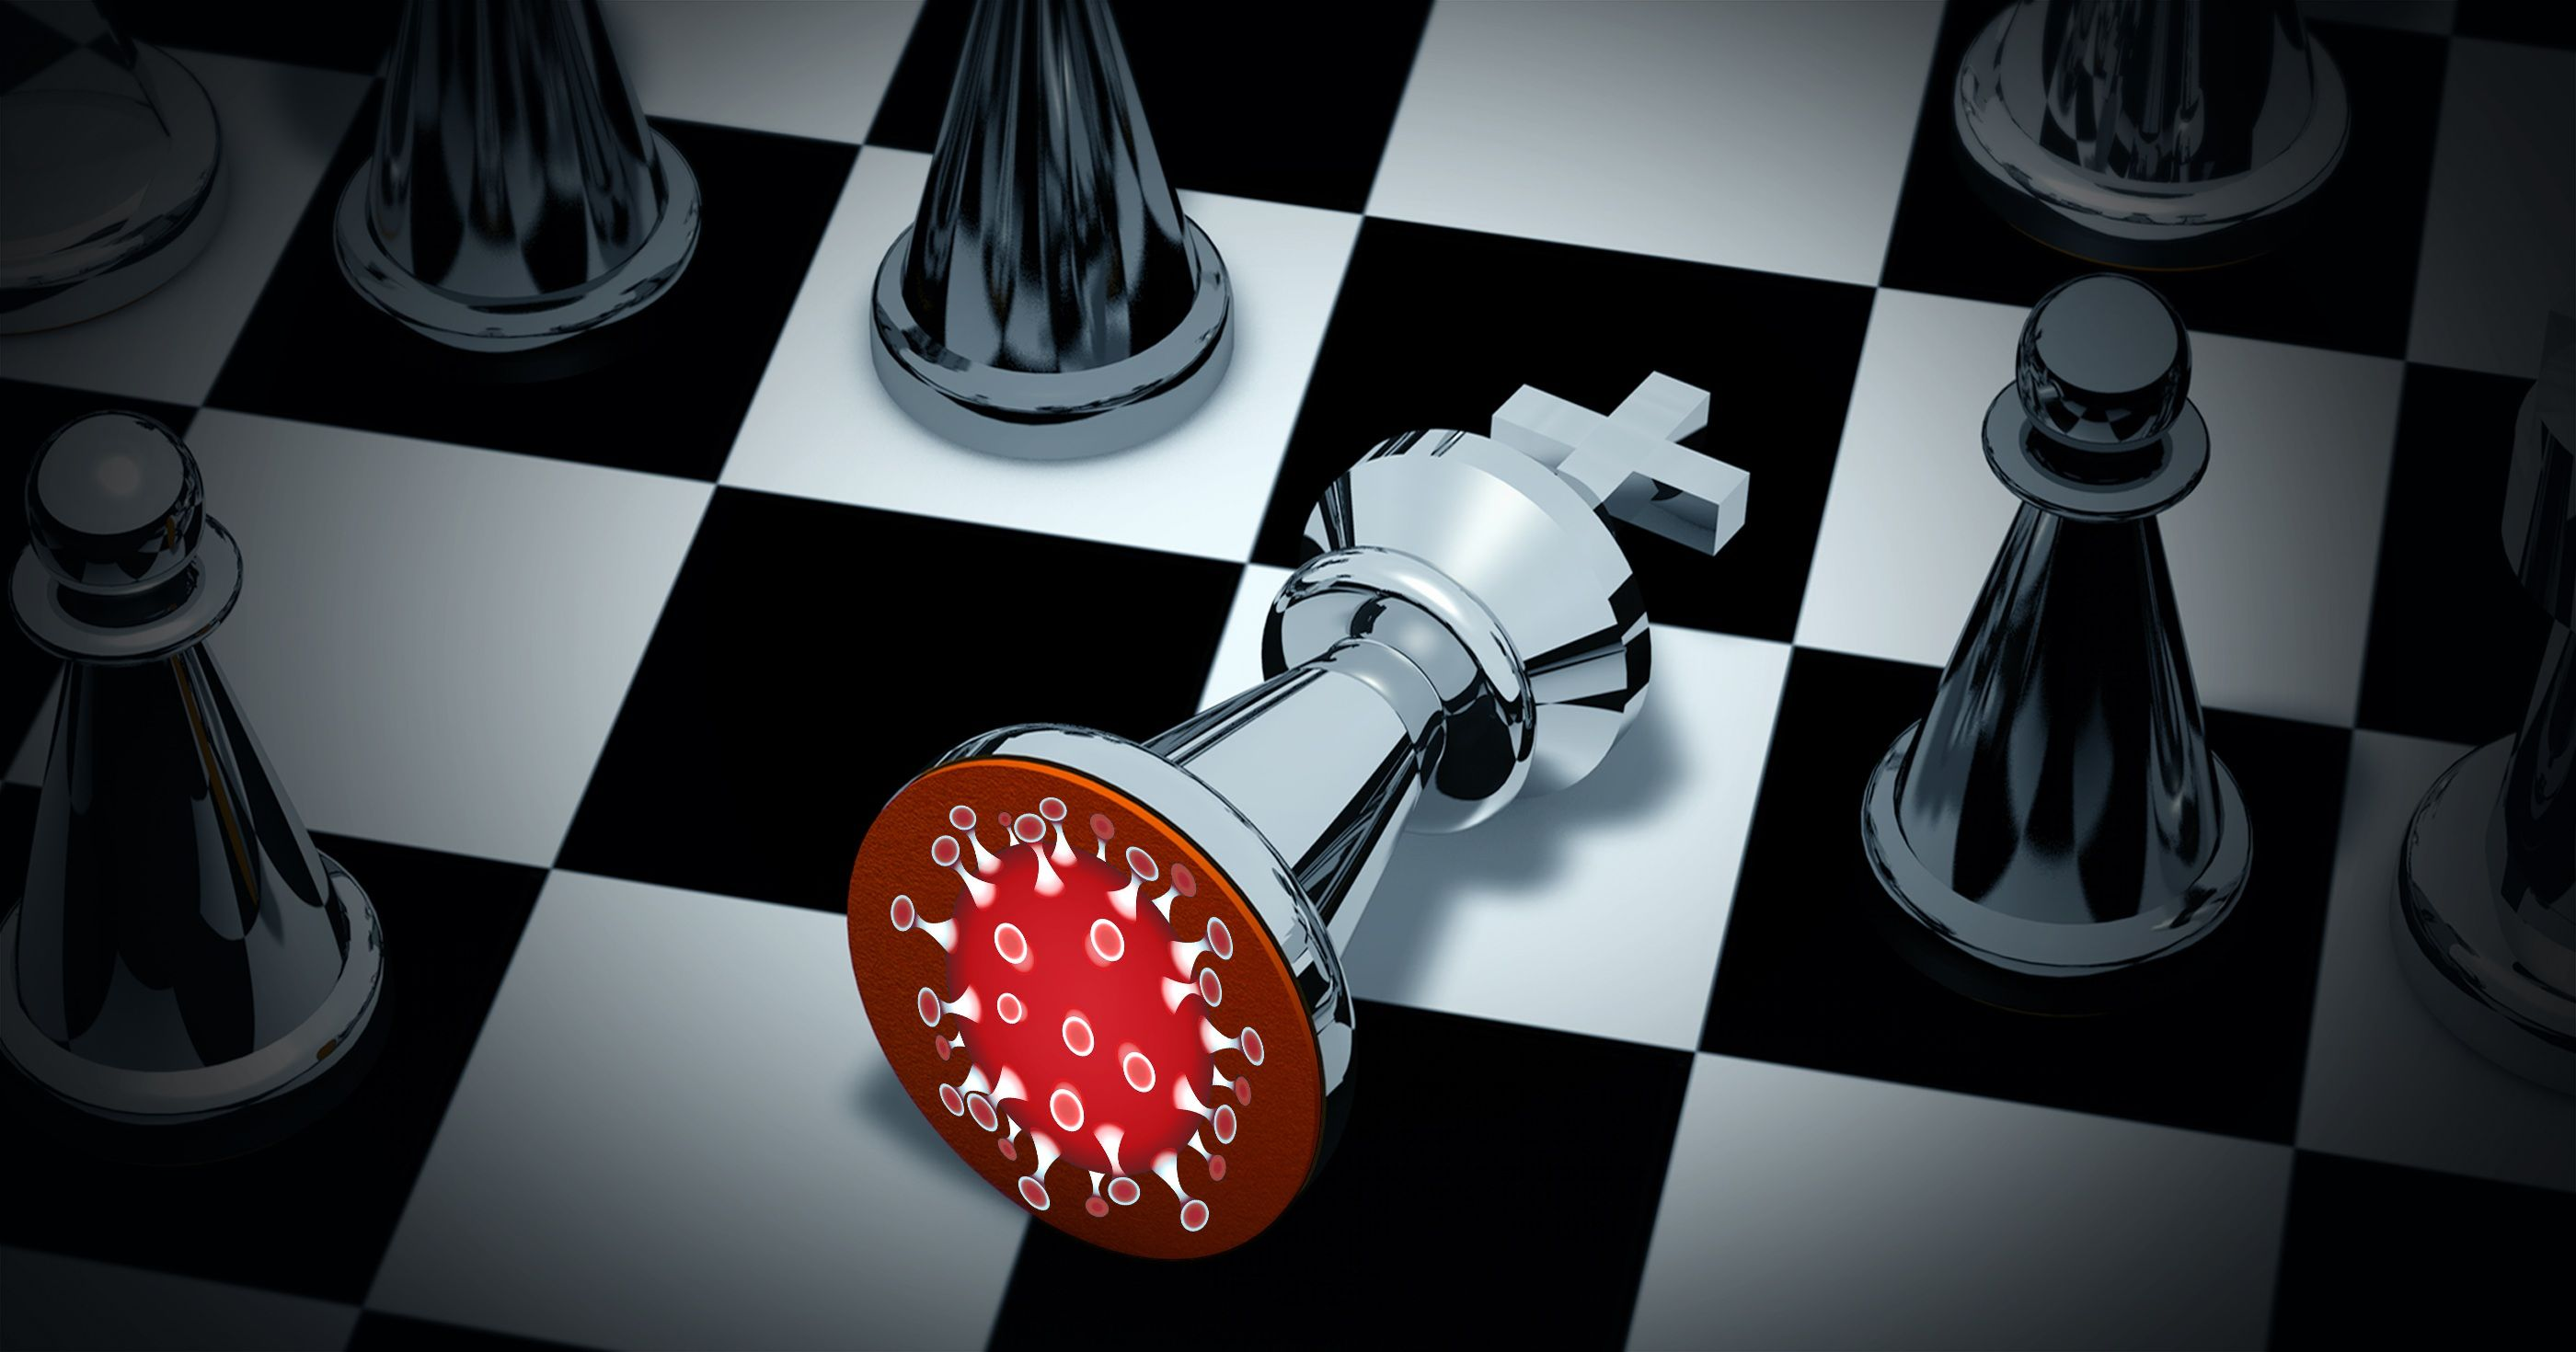 Dem Schach